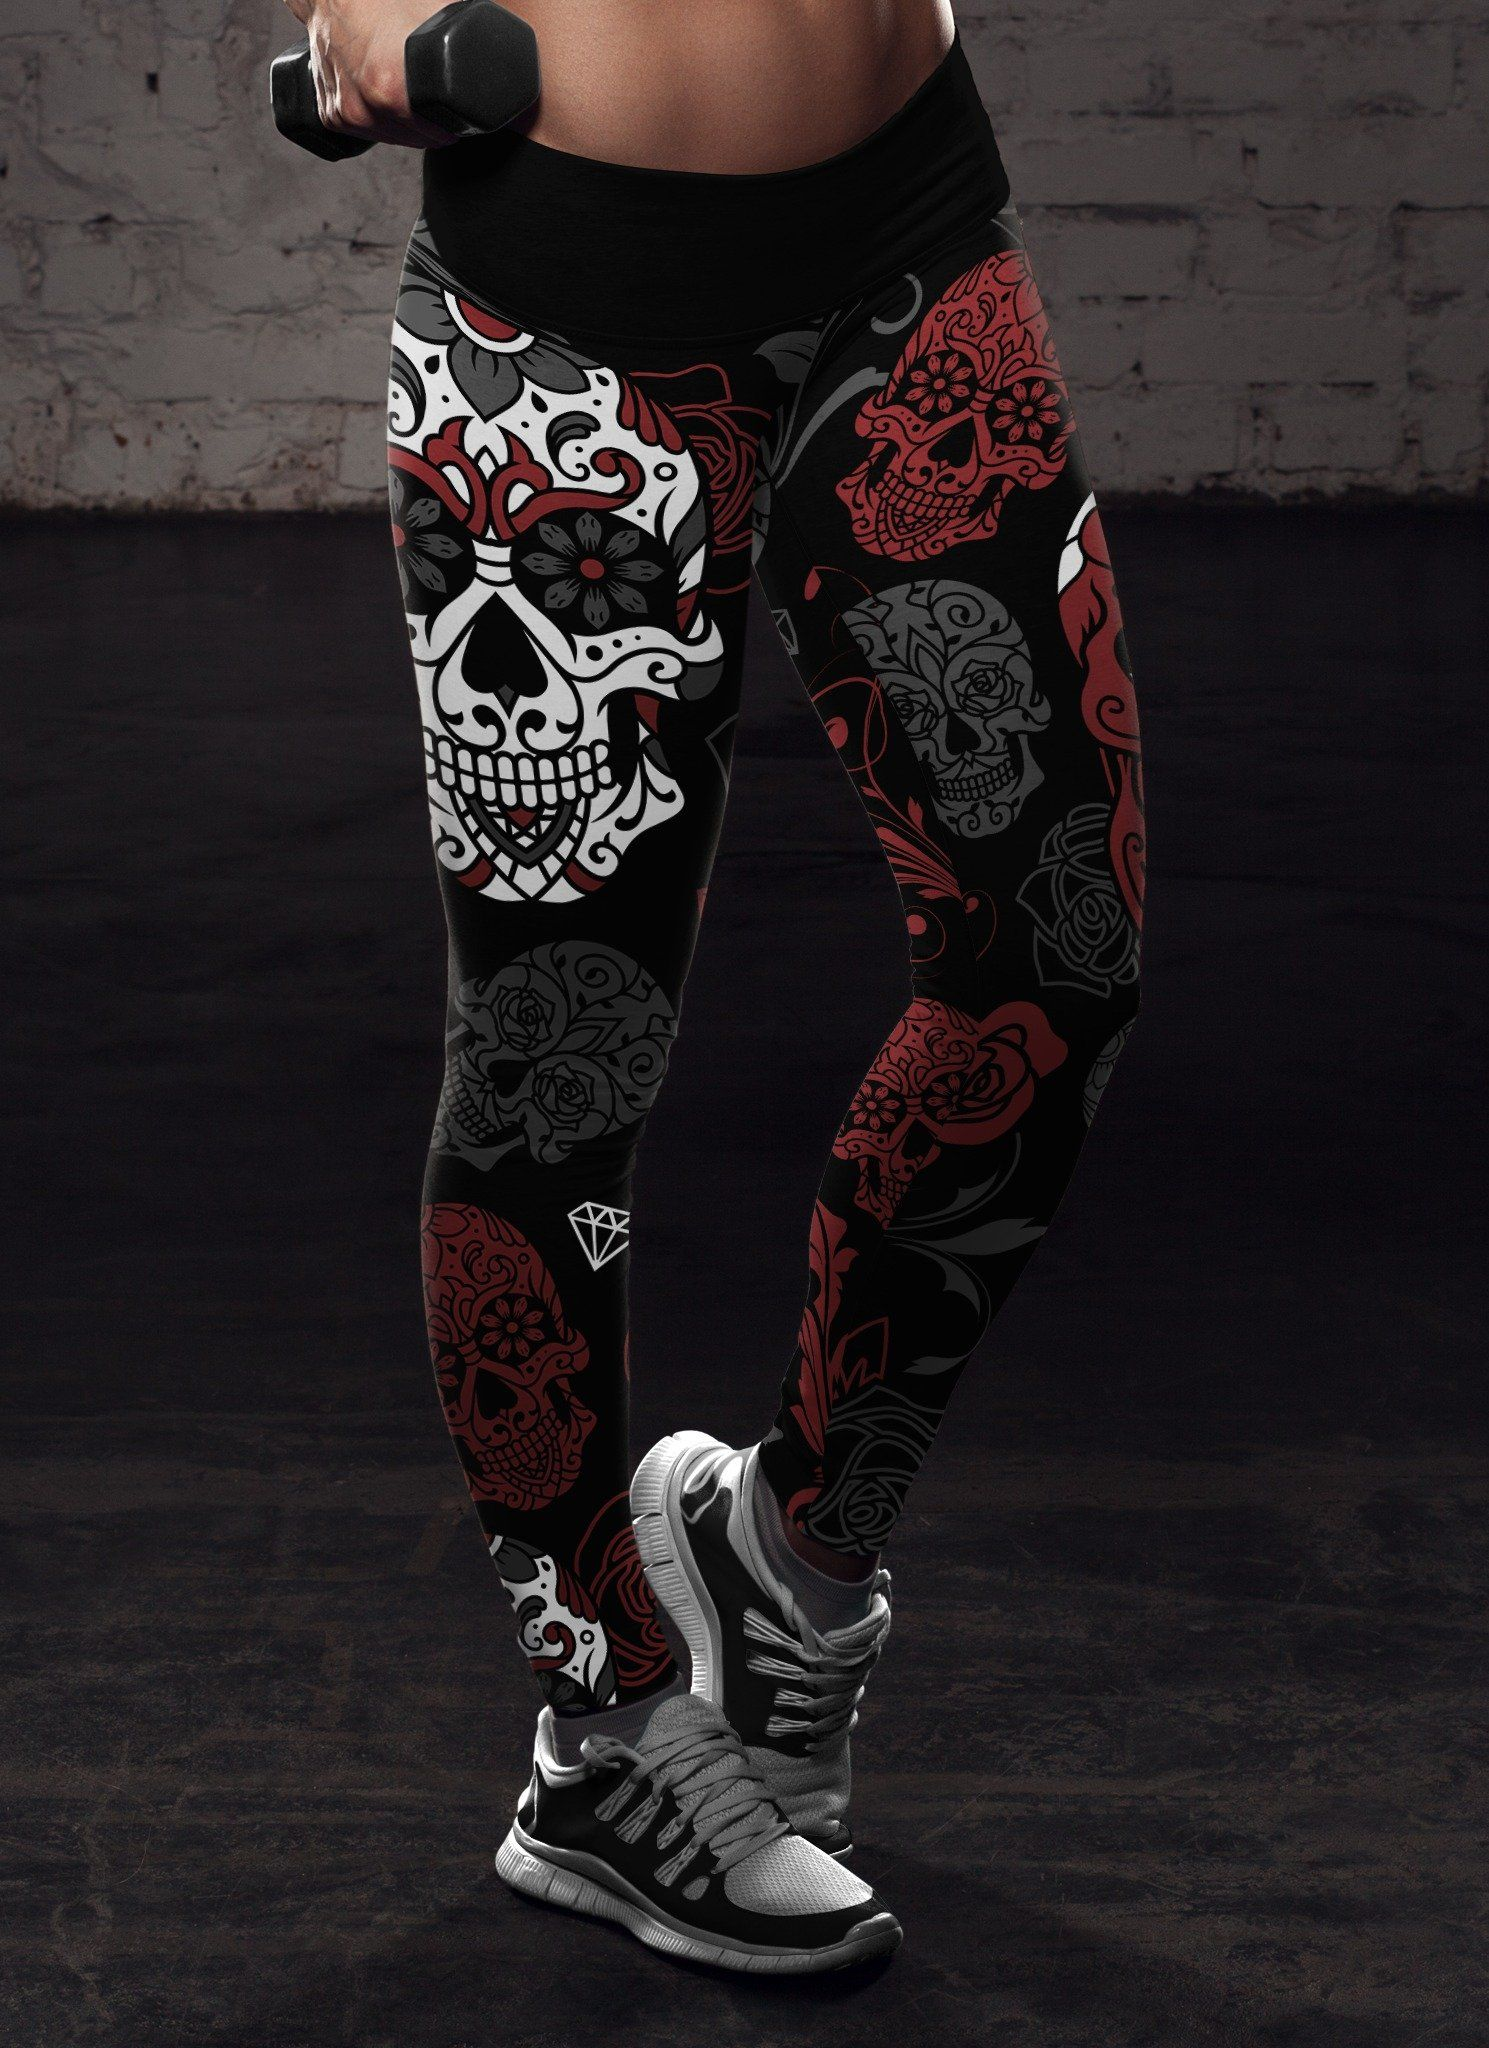 cc401918199f6 Black and Red Sugar Skull Leggings | DIA DE LOS MUERTOS | Pinterest ...